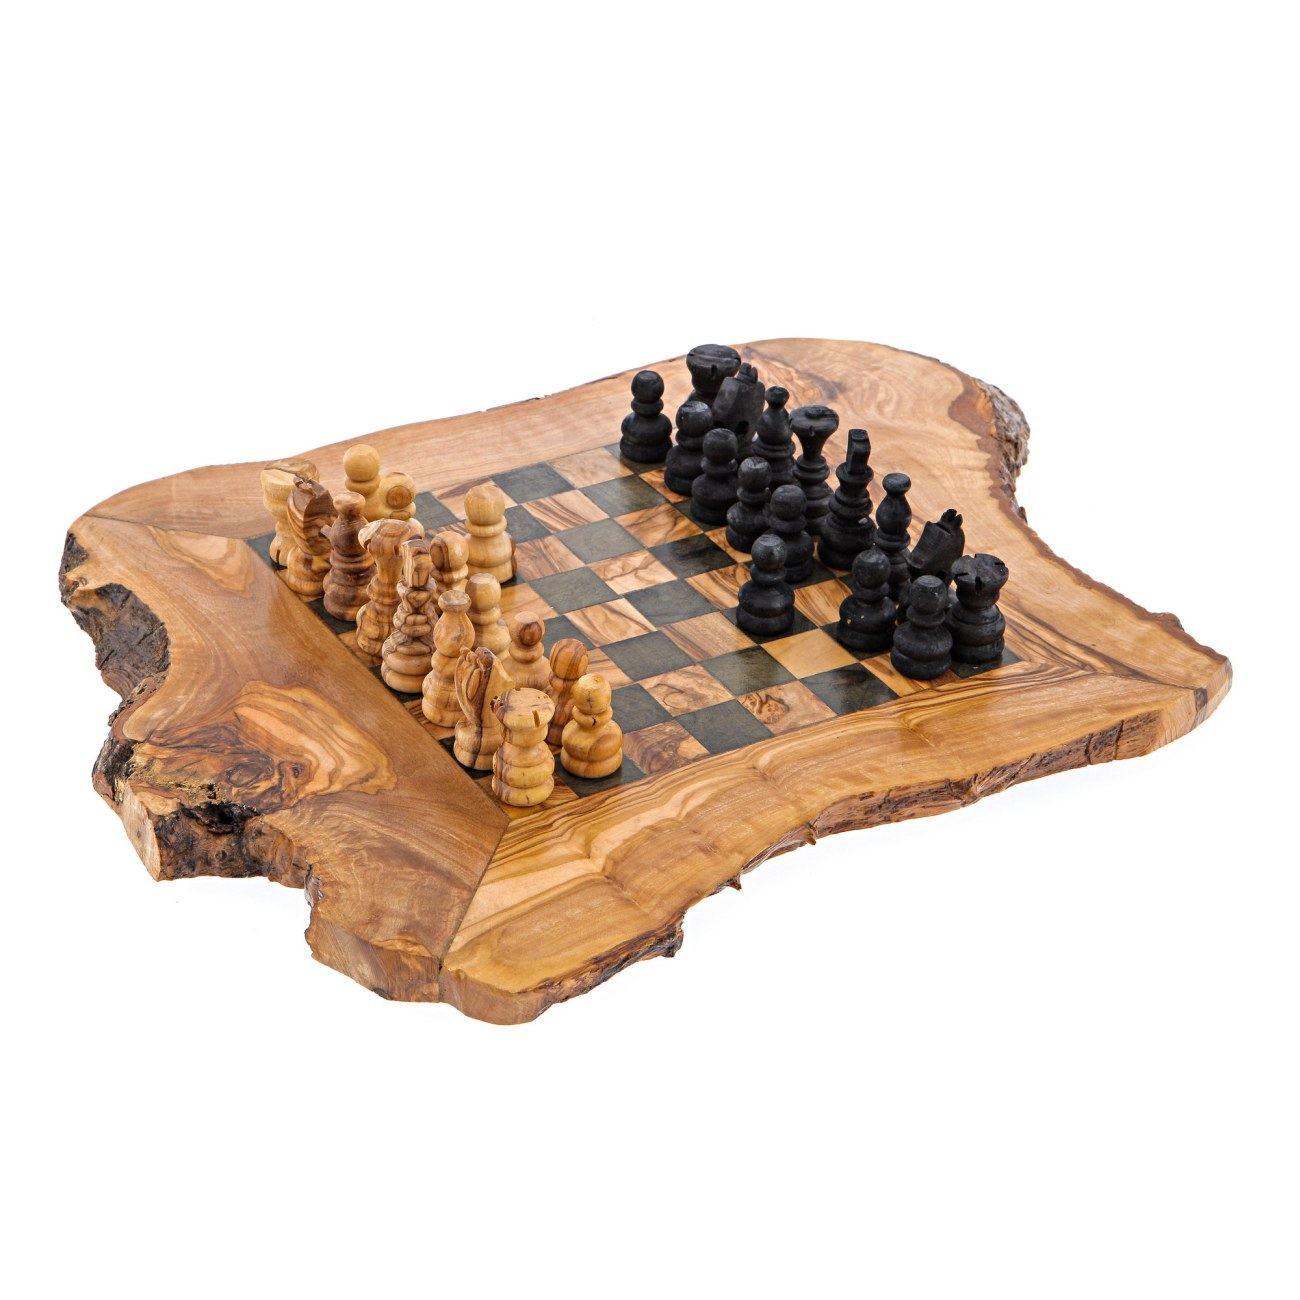 Olive Wood Chess Set Handmade